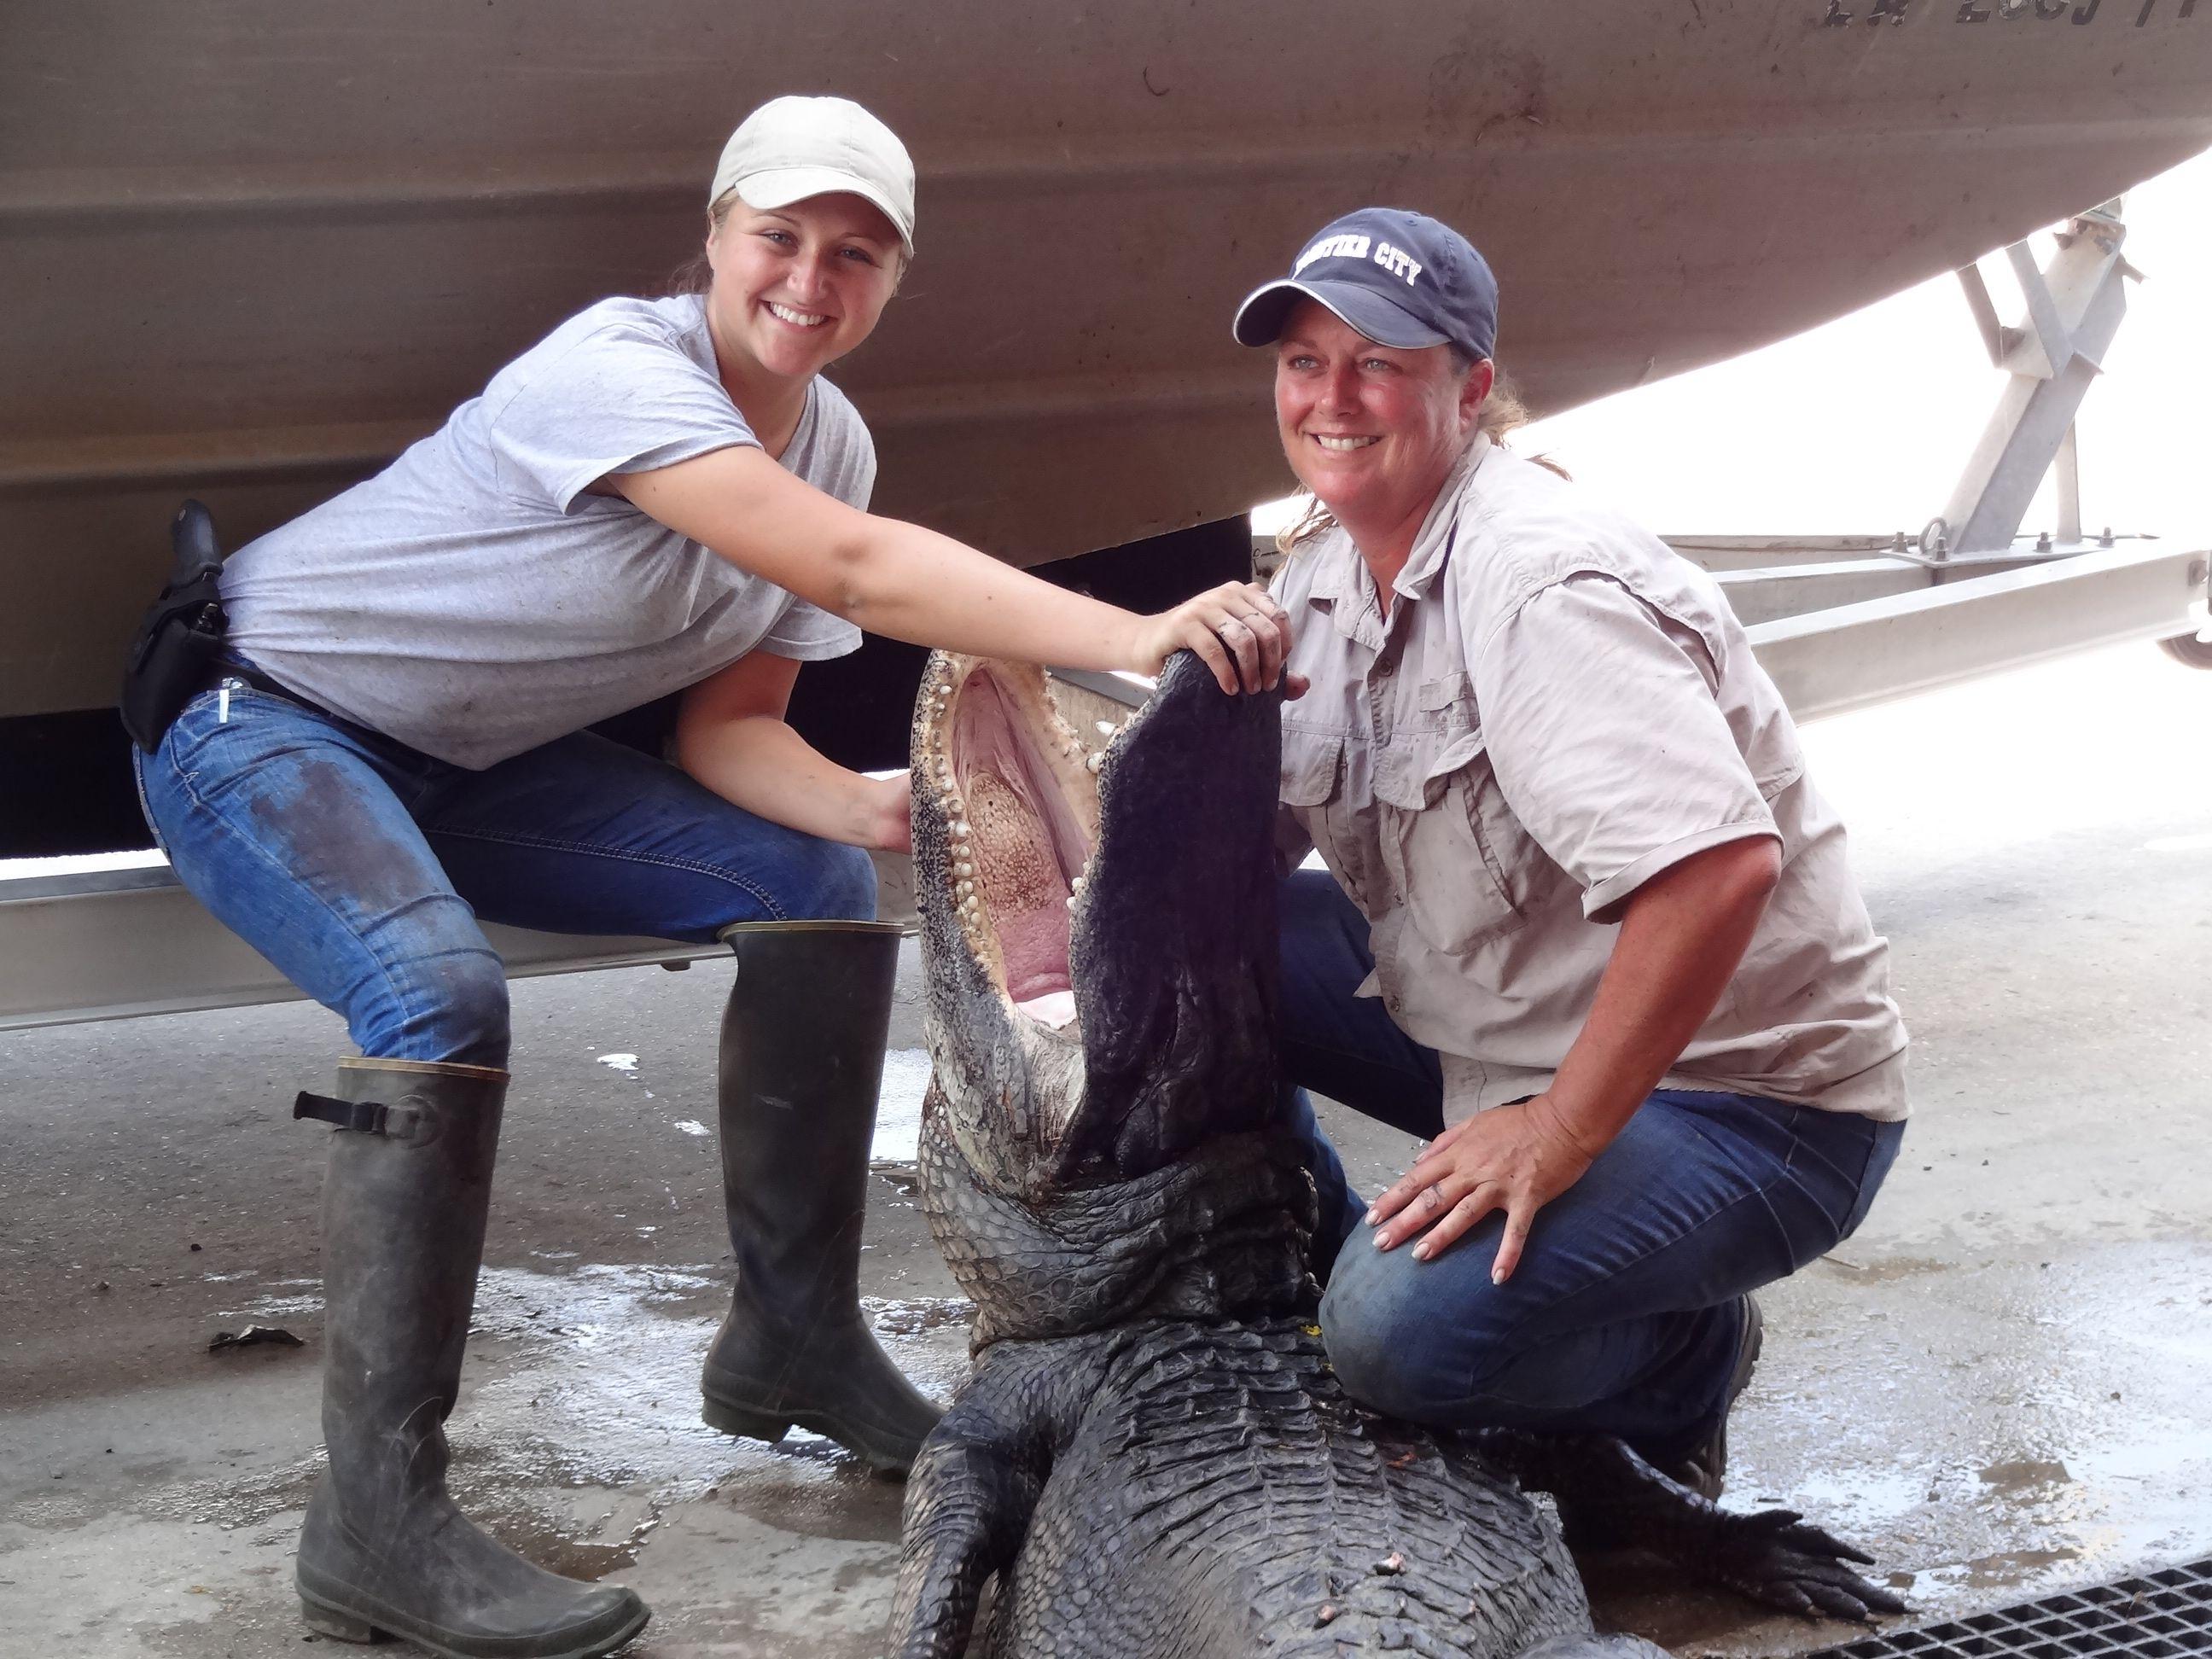 Liz Cavalier and his daughter, Jessica holding a massive alligator.